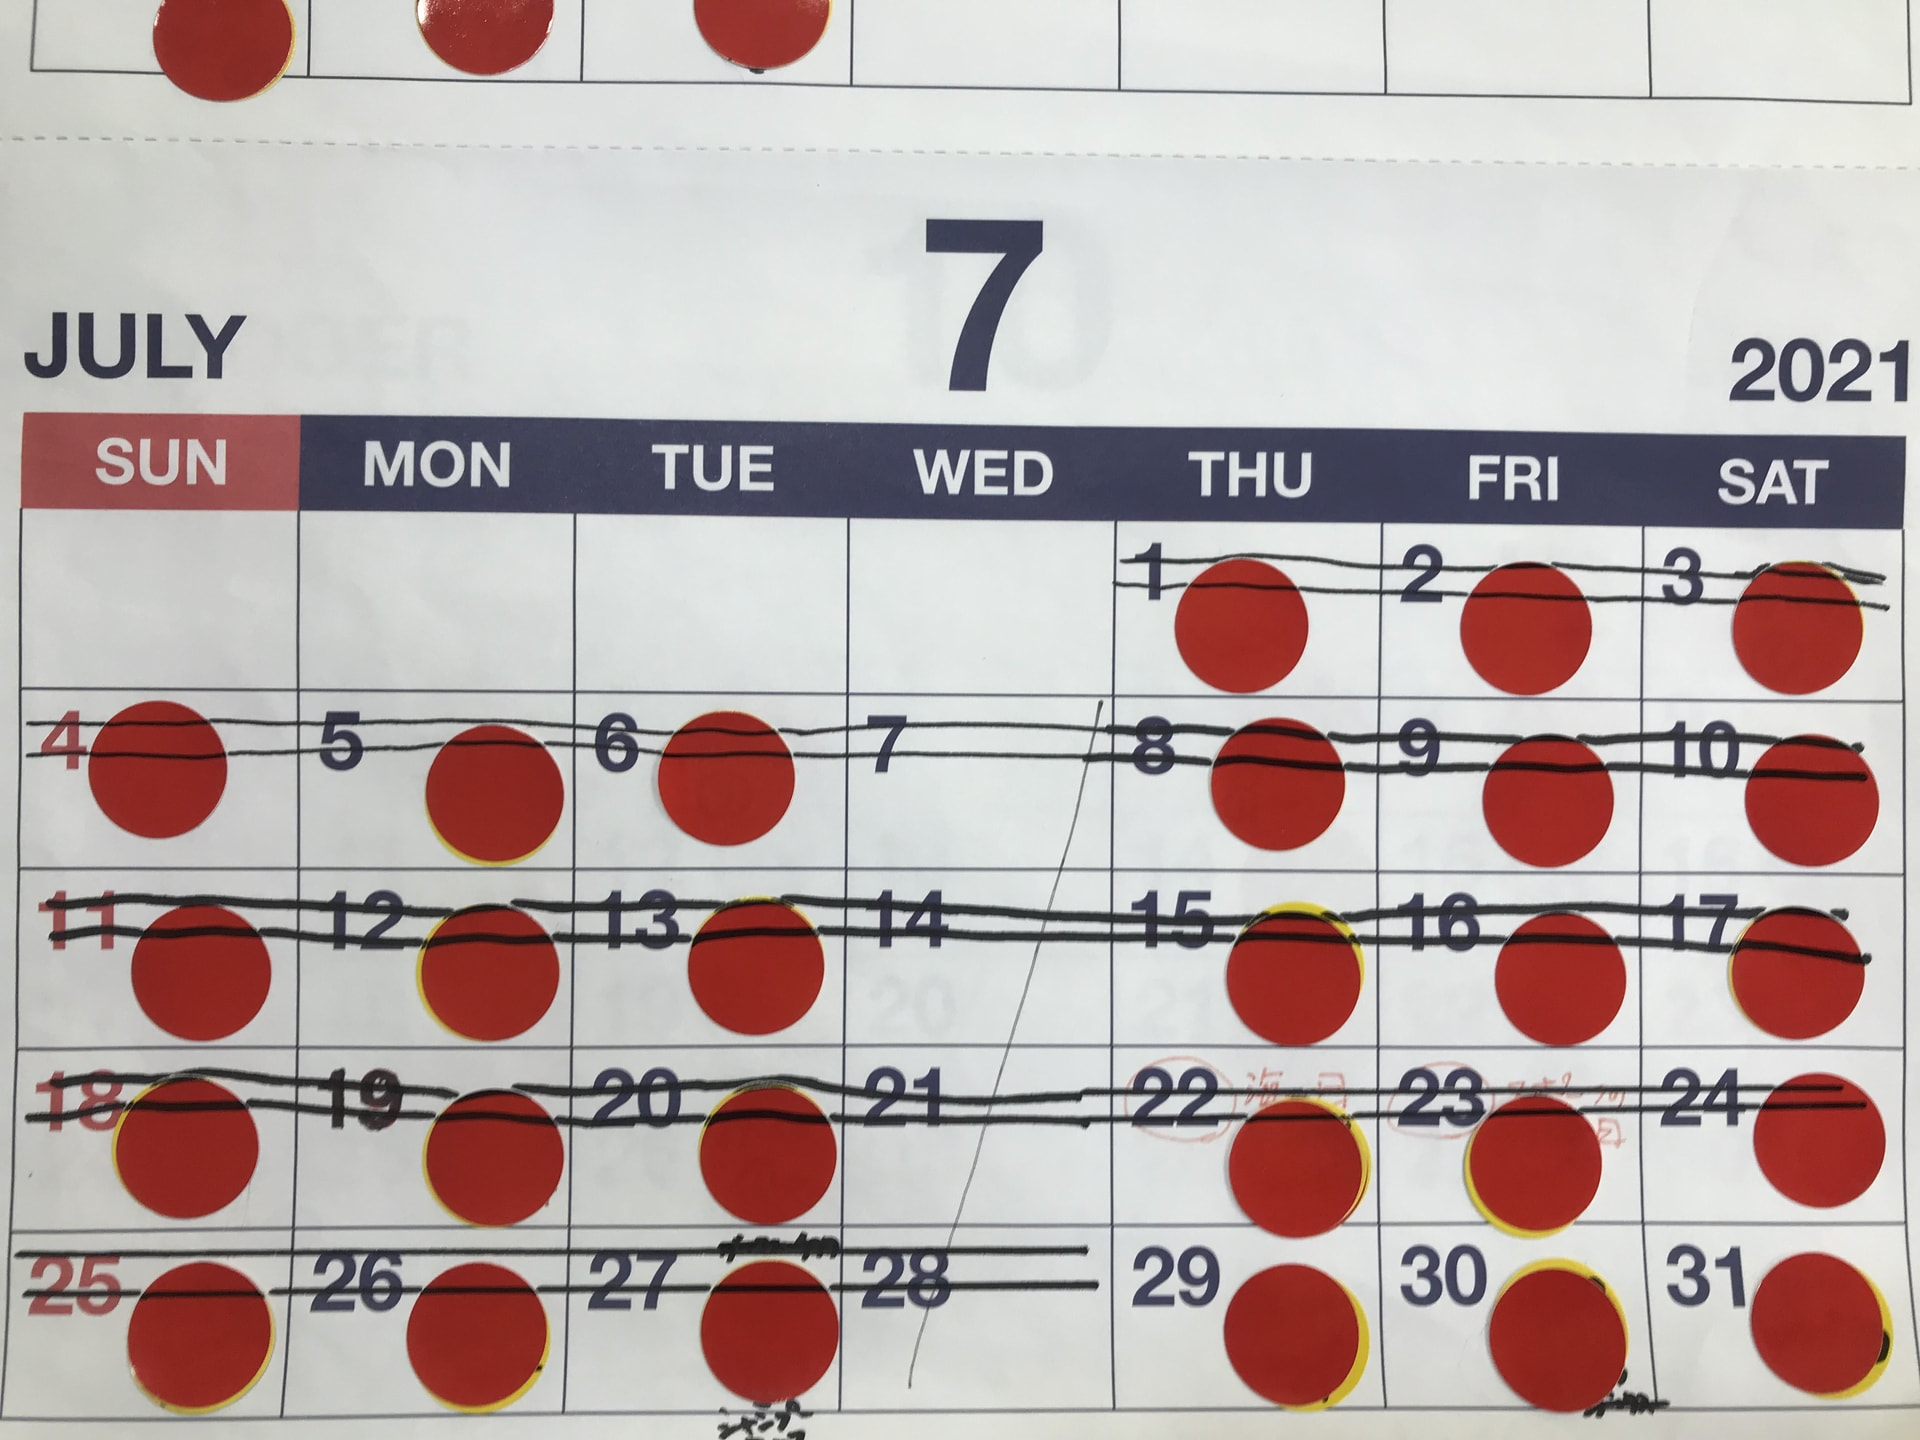 予約状況のご案内(2021年7月28日現在)毎週水曜更新予定